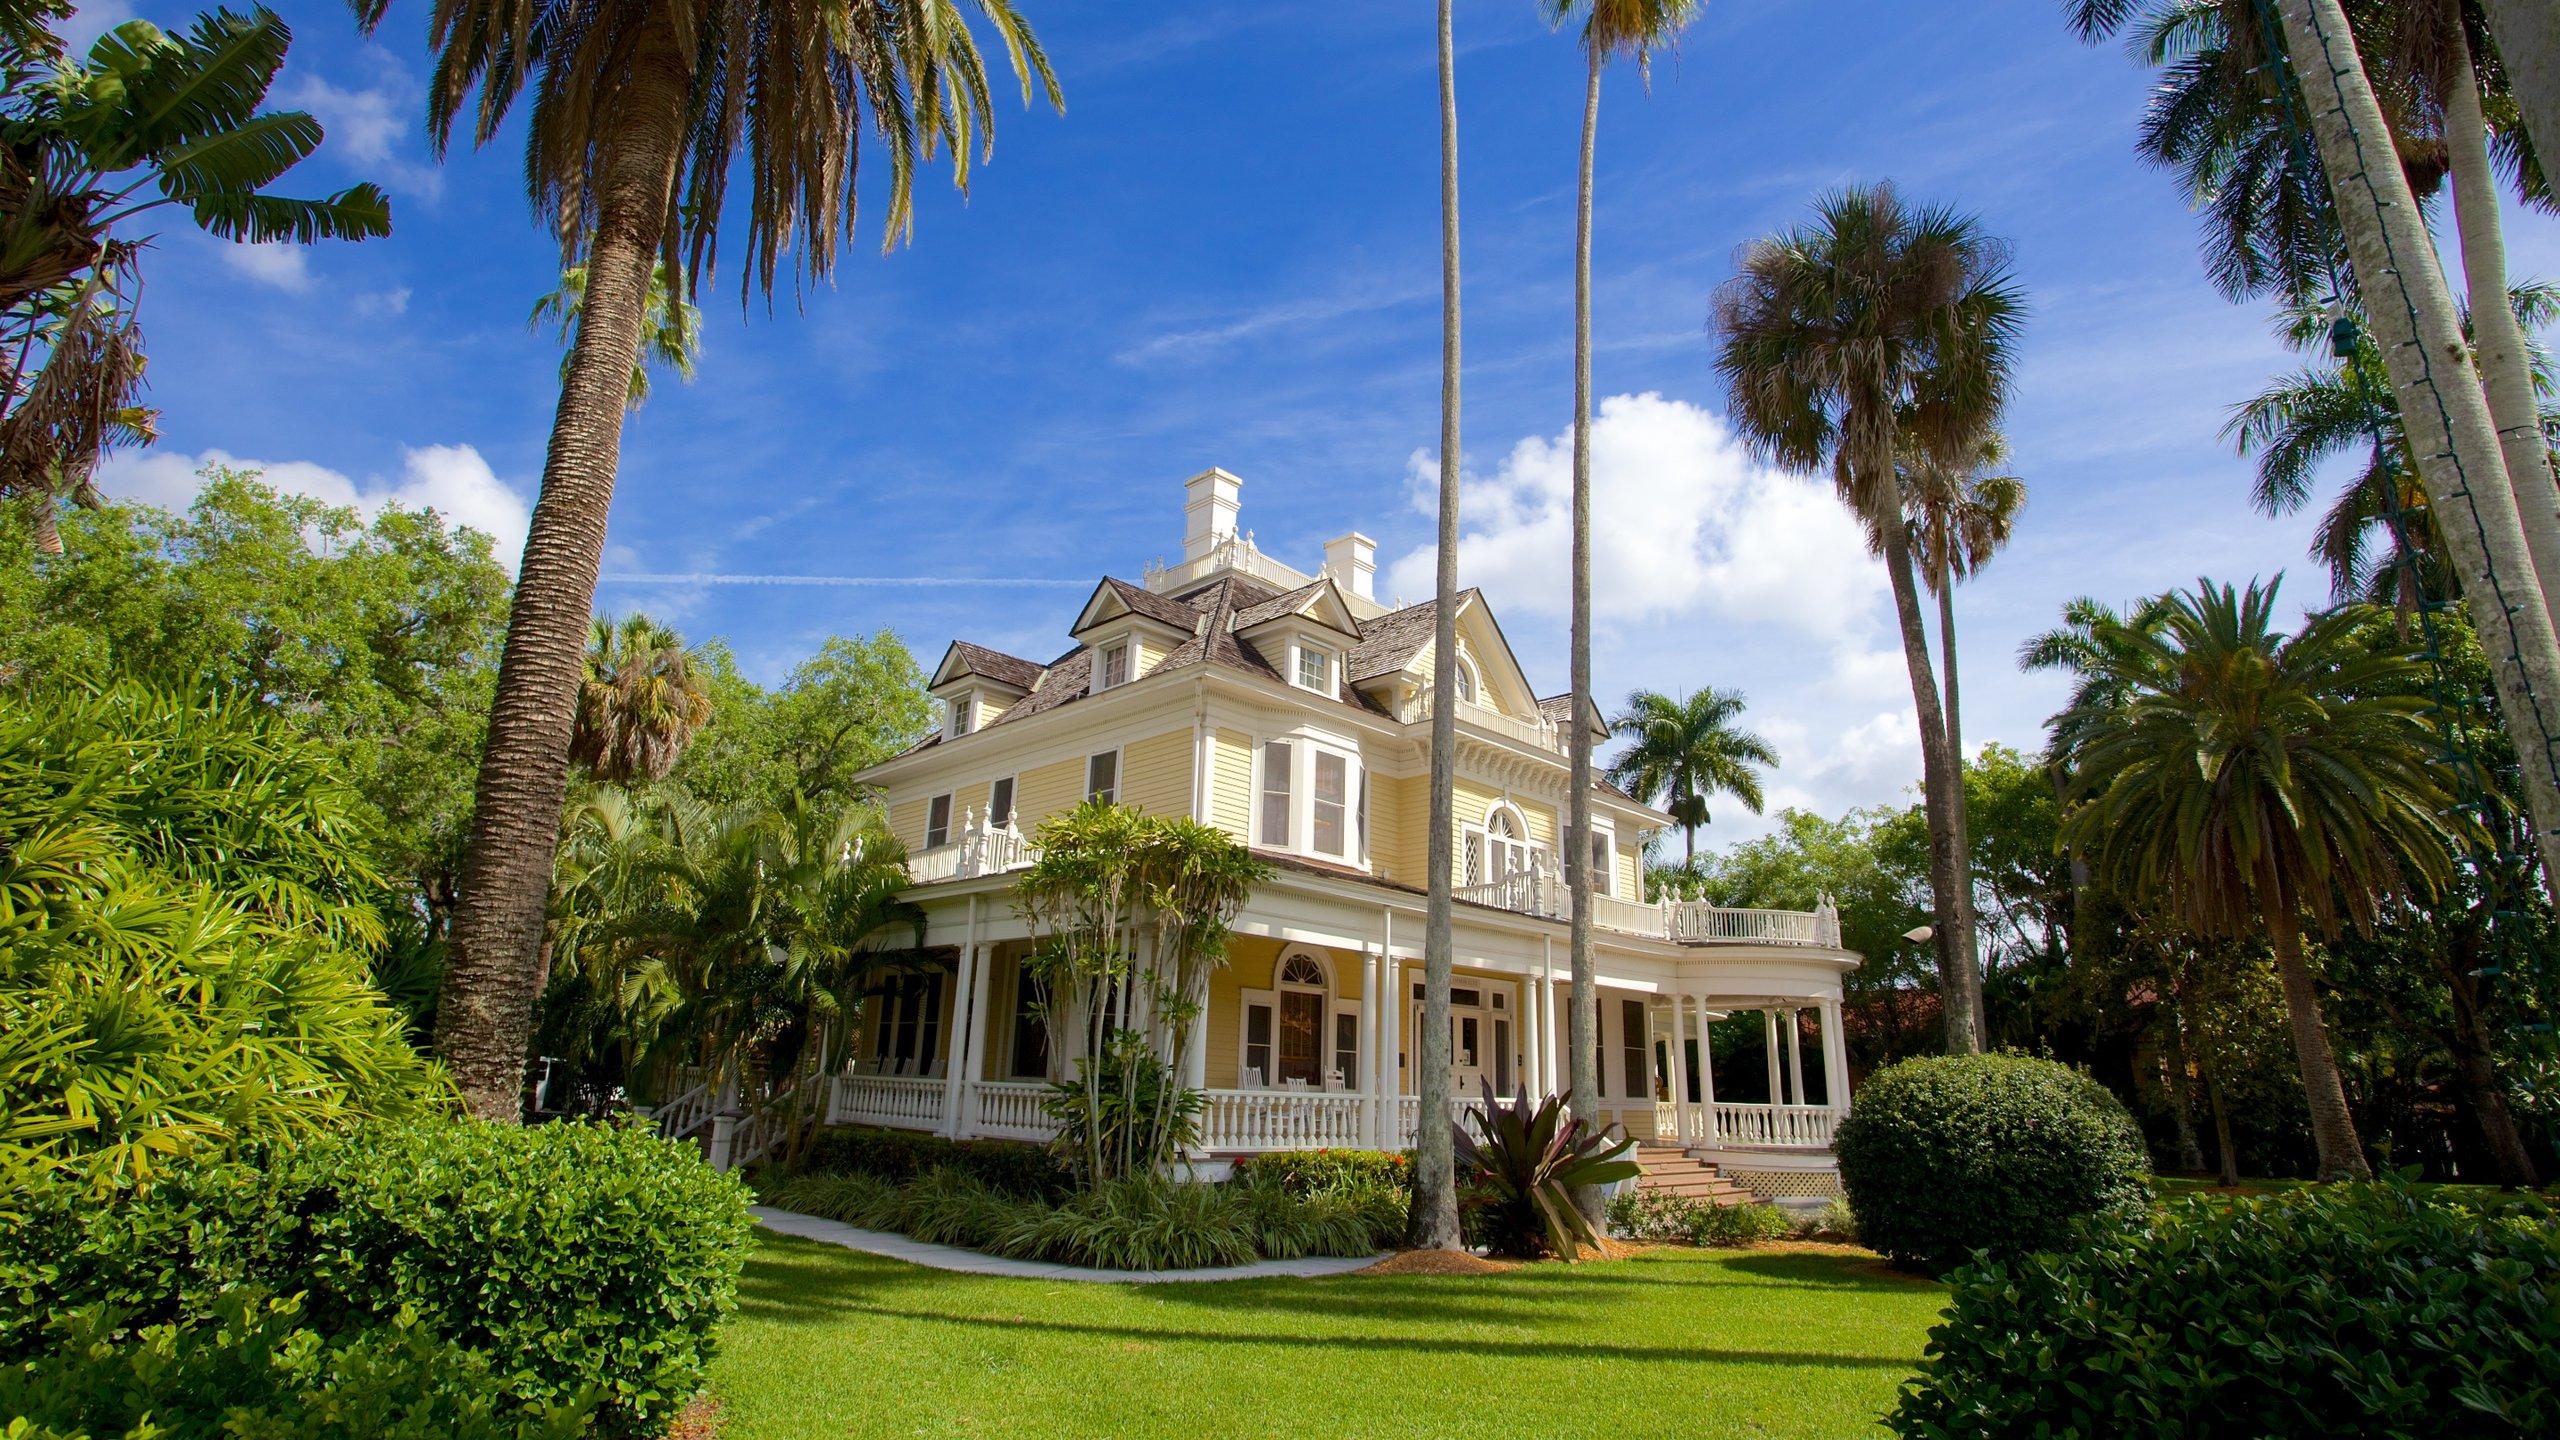 Södra Florida, Florida, USA